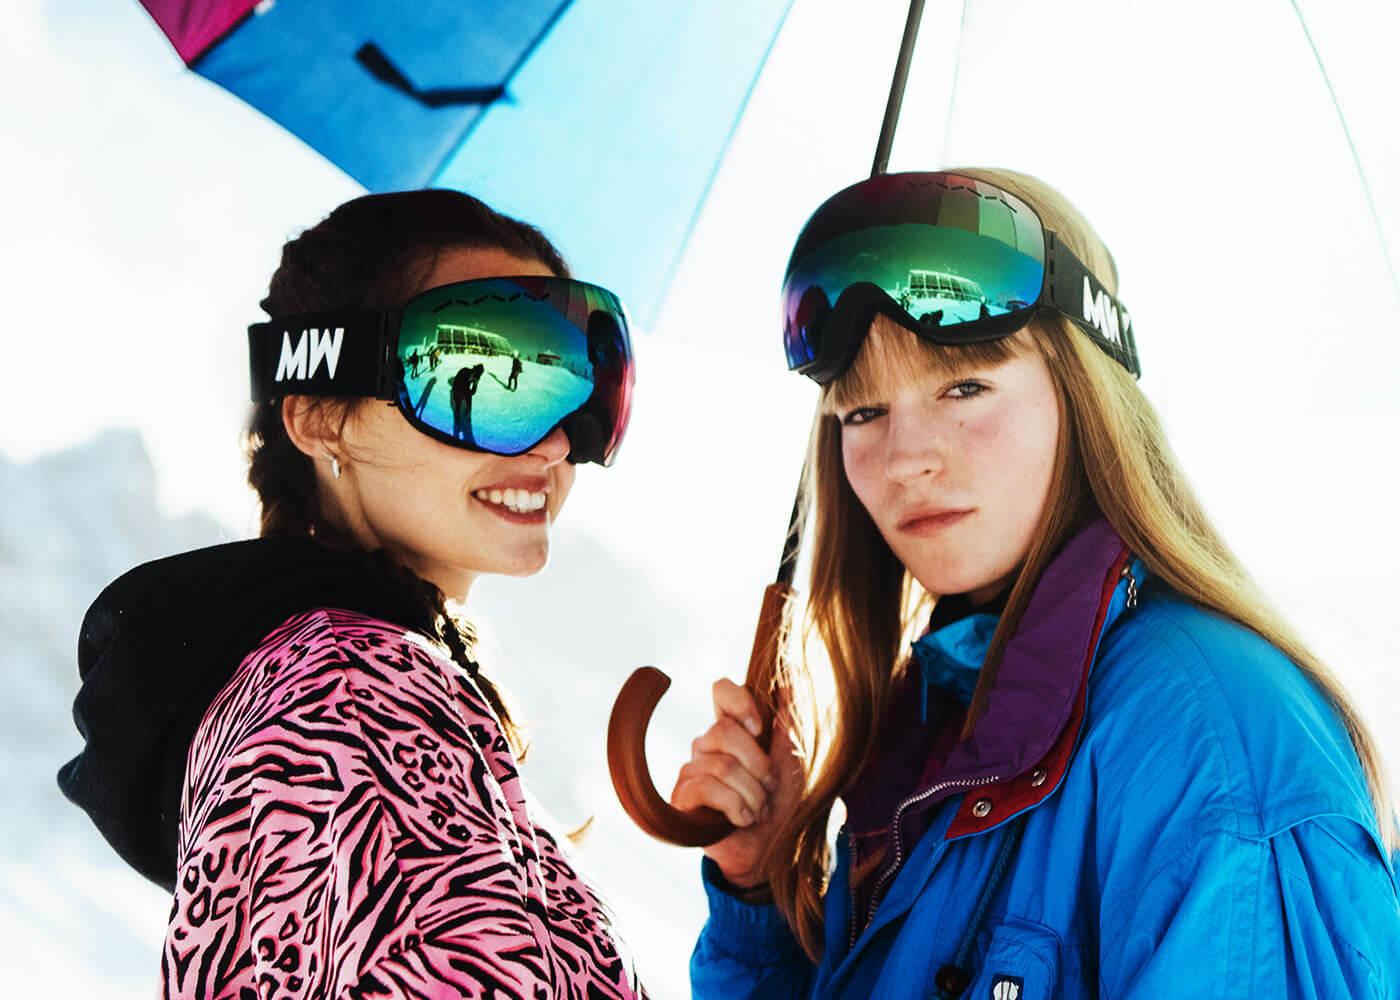 messyweekend-ski-goggles (1)